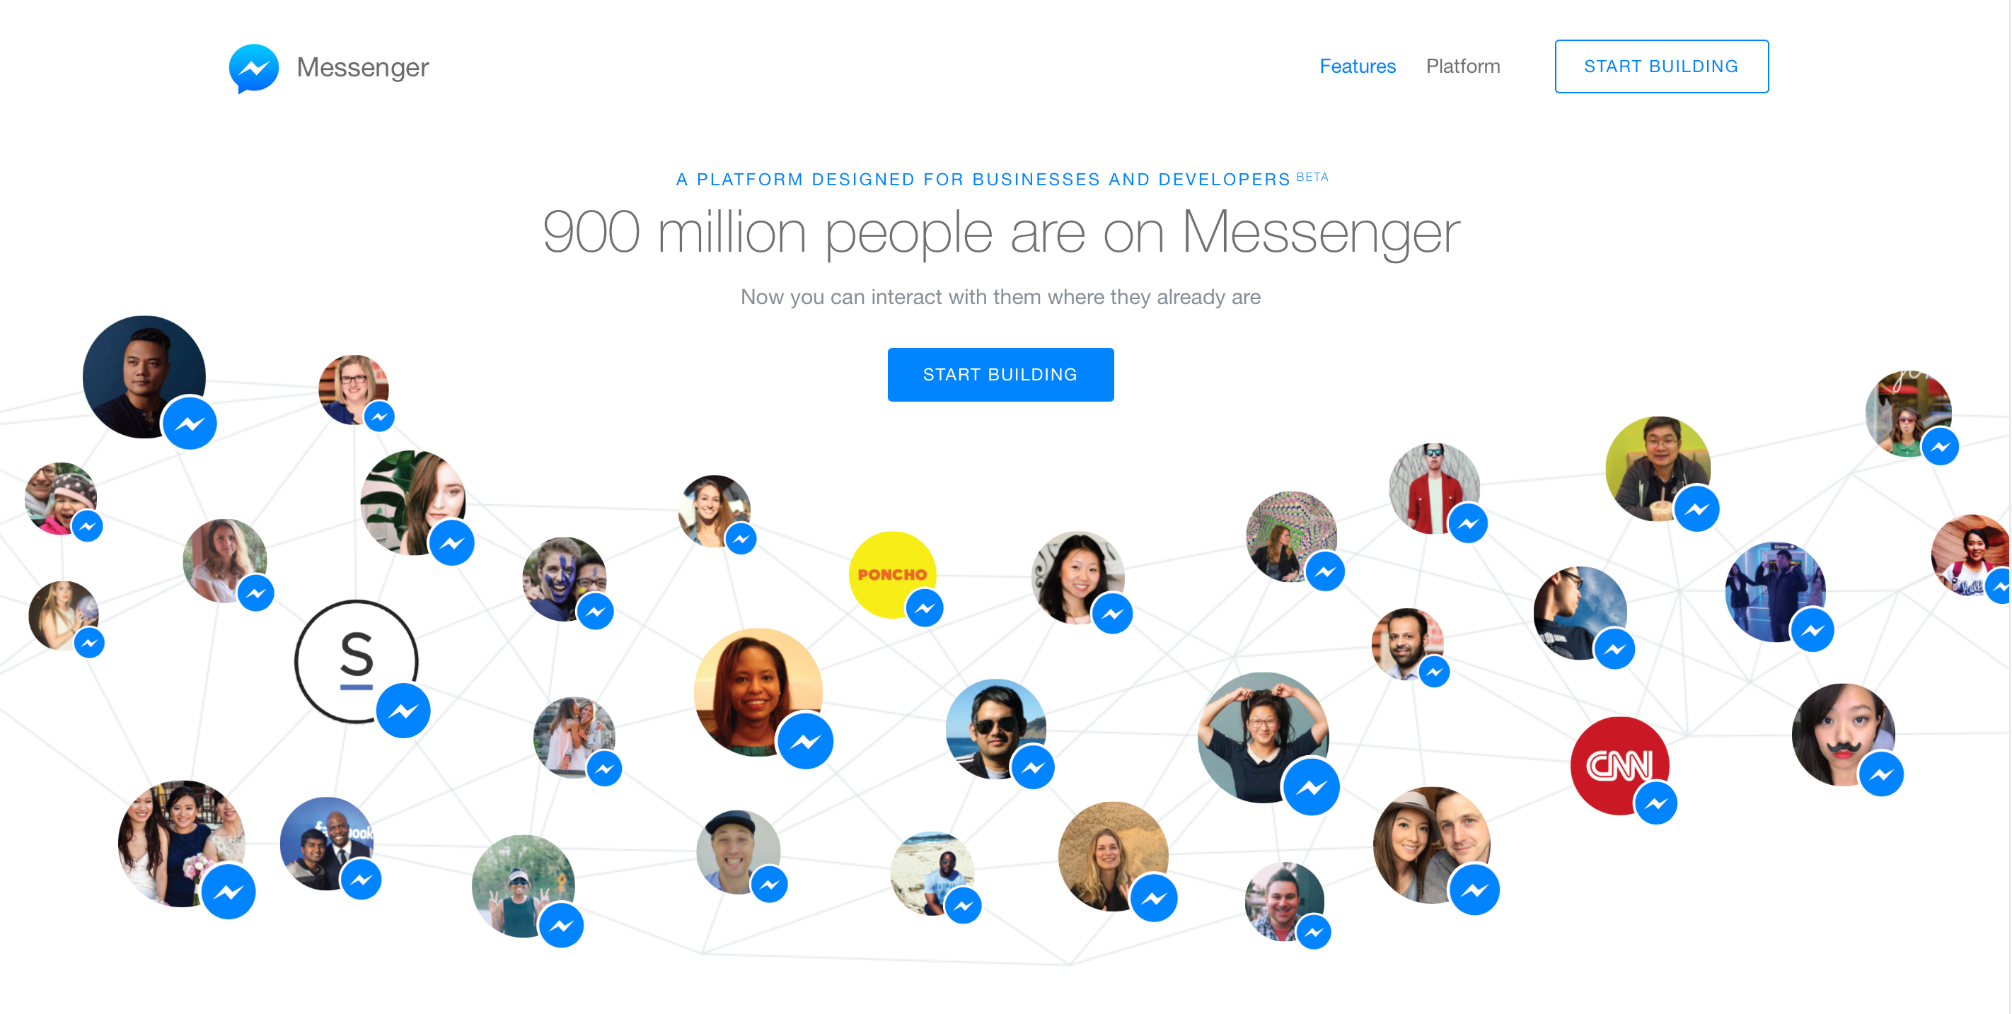 facebook messenger platform betaでできる全ての事を試してみた line